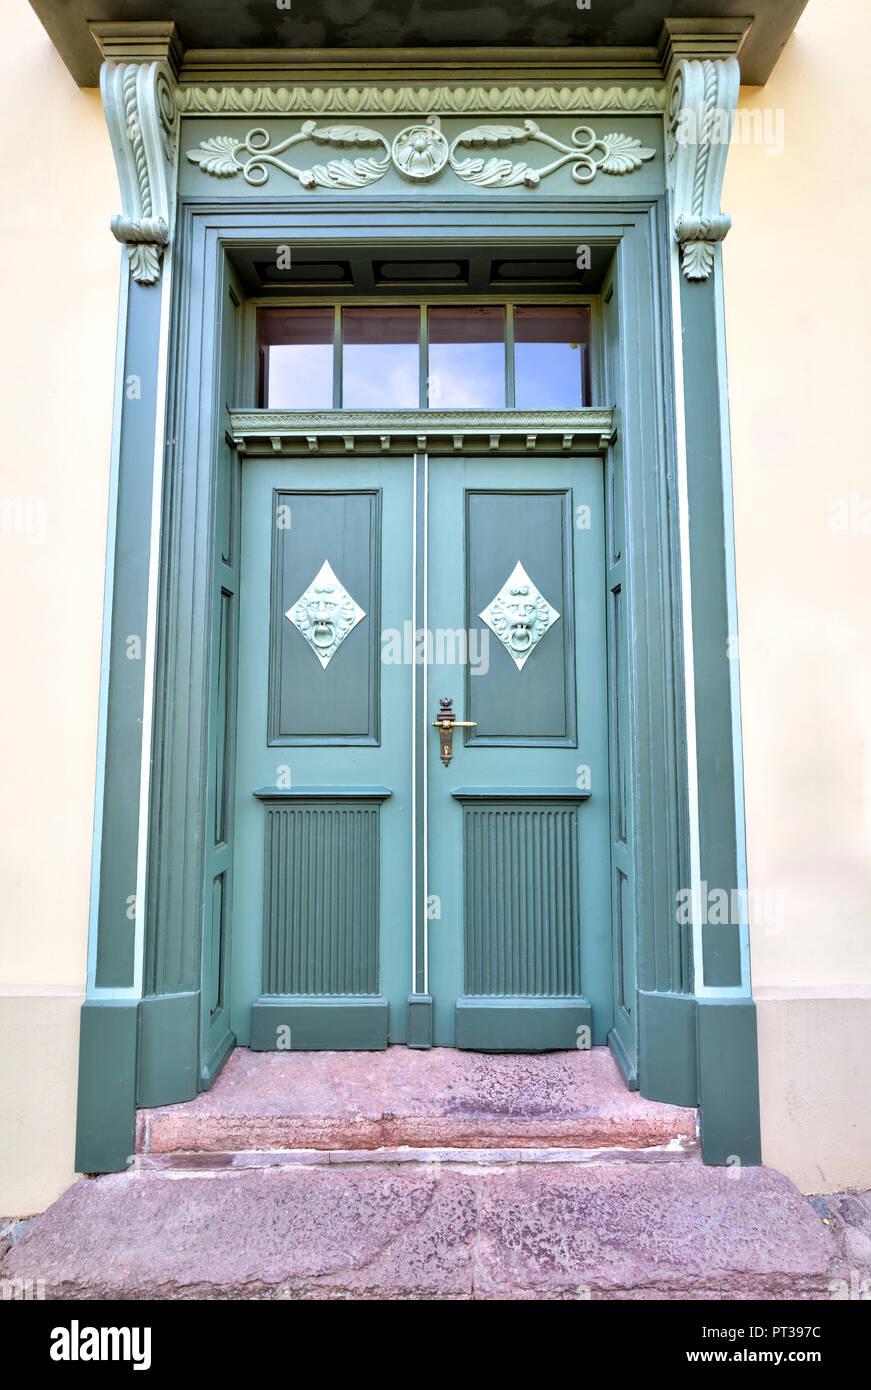 House facade, front door, Wismar, Baltic Sea coast, Mecklenburg-Vorpommern, Germany, Europe - Stock Image